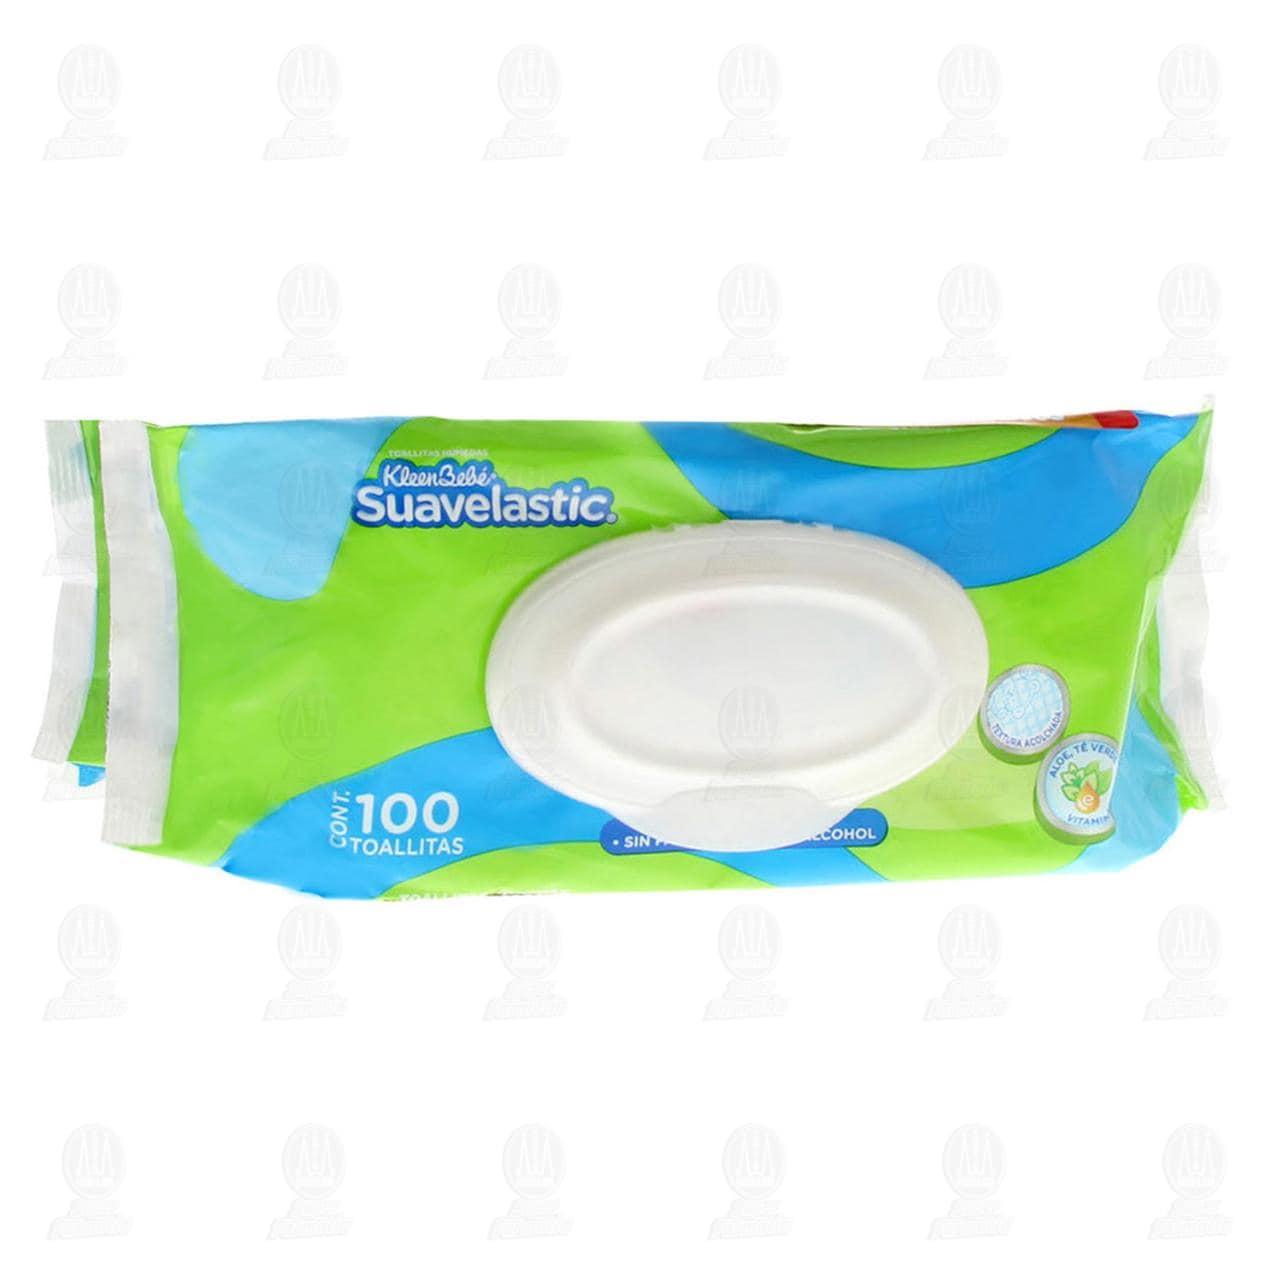 Comprar Pack Toallitas Húmedas KleenBebé, 100 pzas. en Farmacias Guadalajara